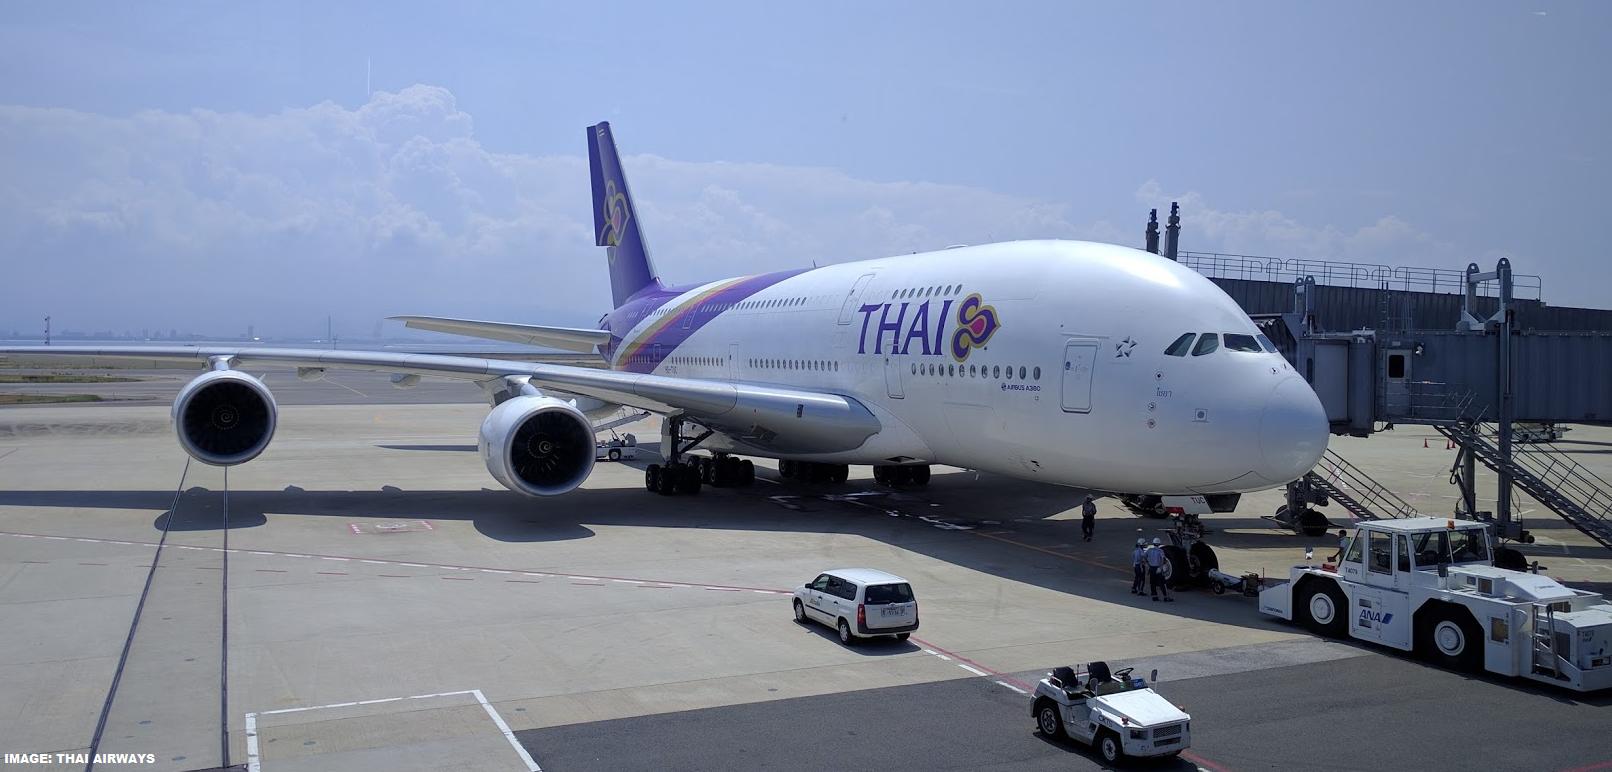 Thai Airways 50% Off Award Ticket Promotion For Travel ...